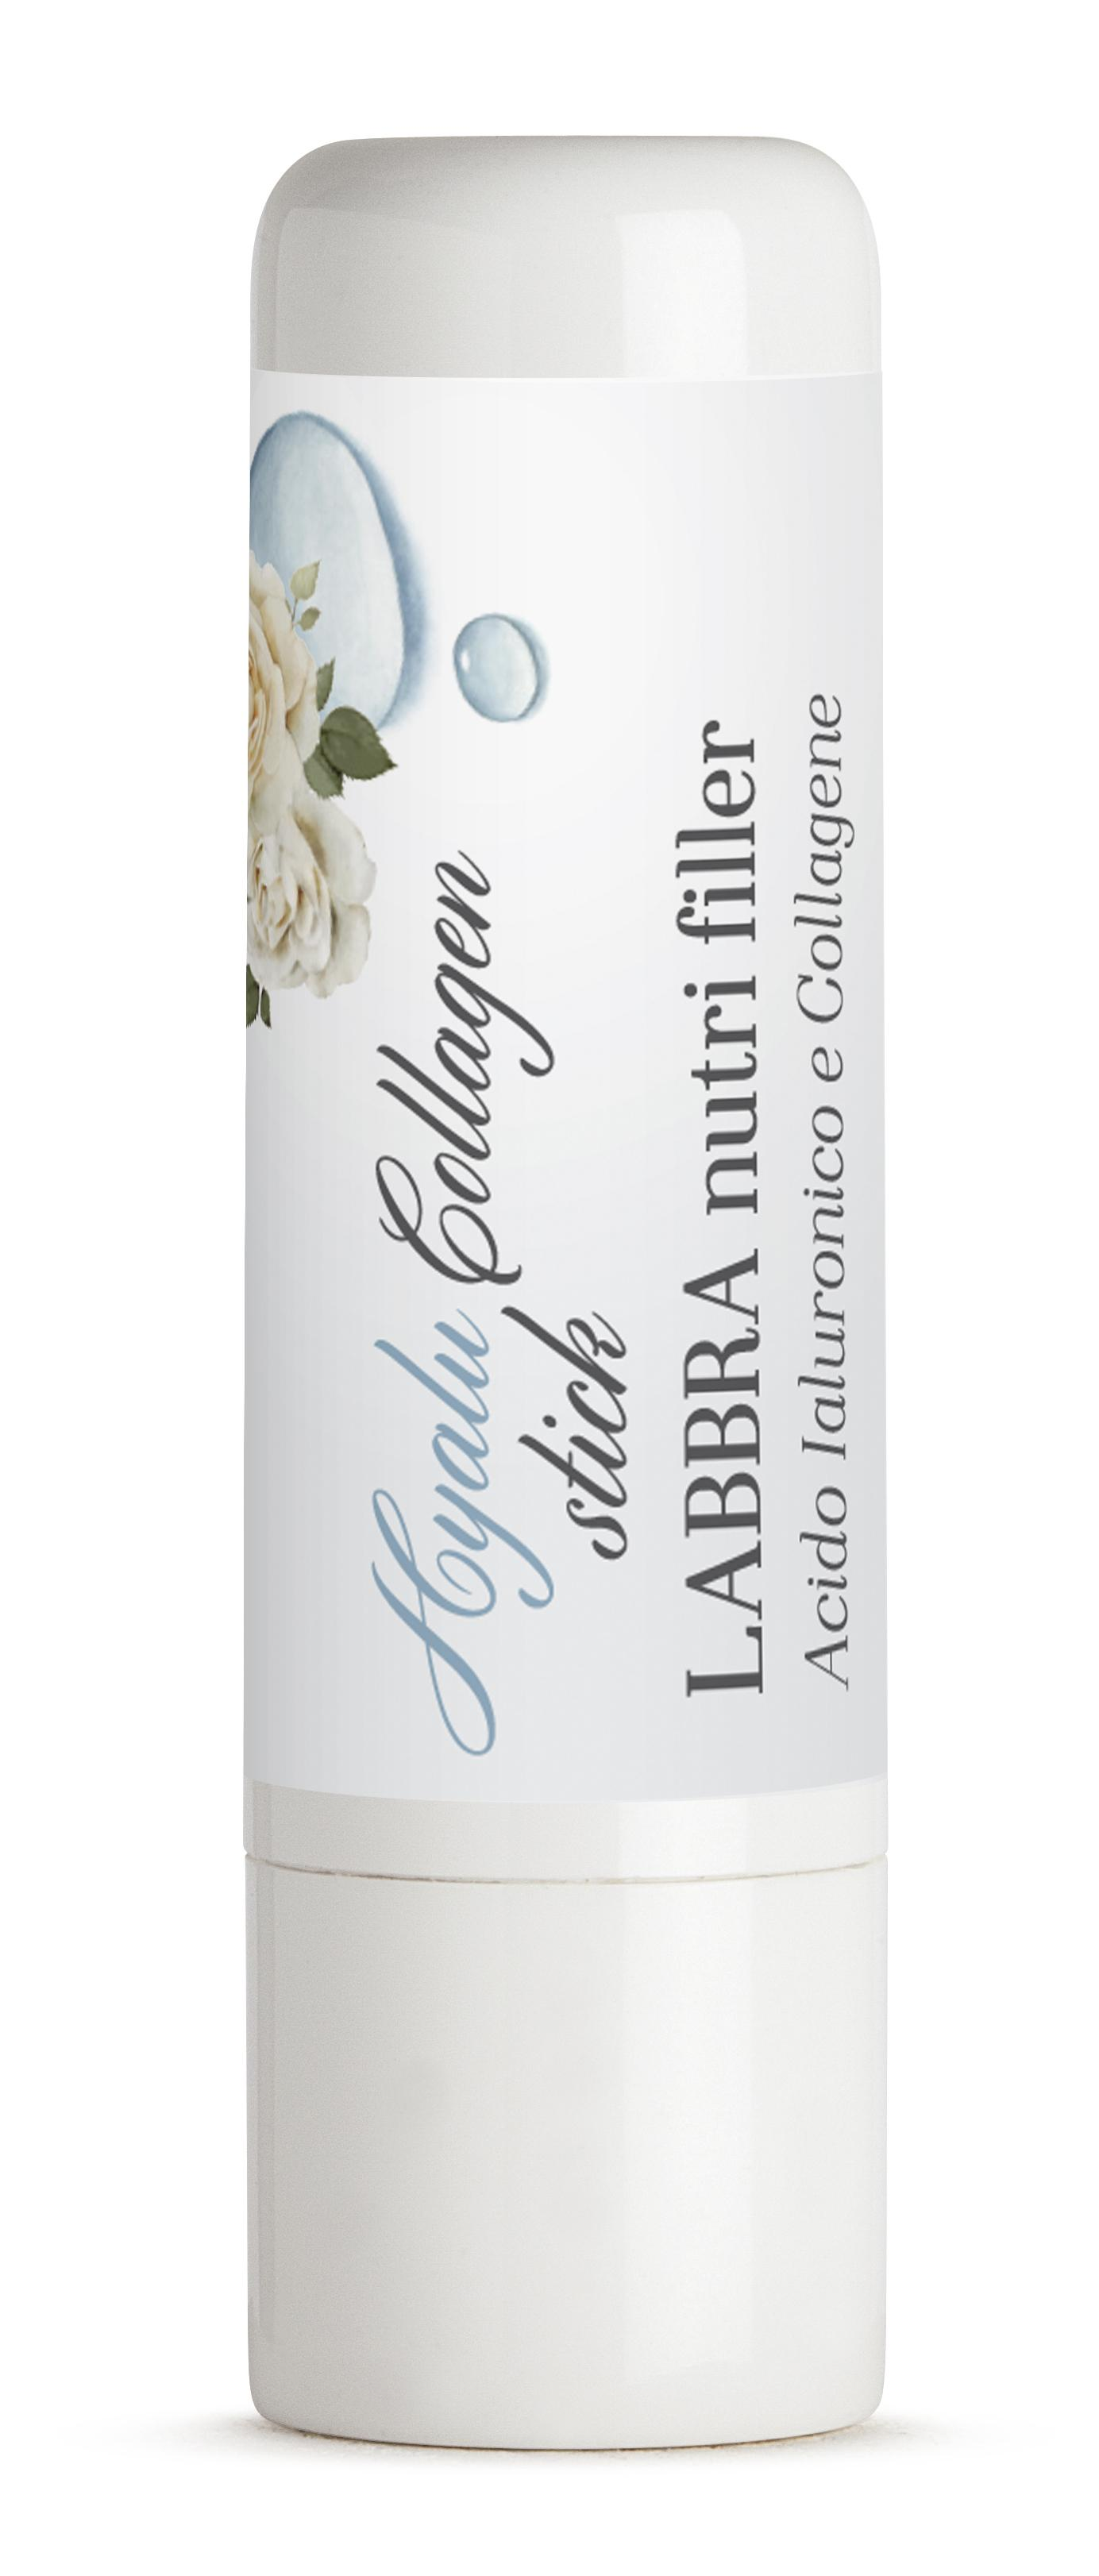 Hyalu Collagen Stick Labbra Nutri Filler